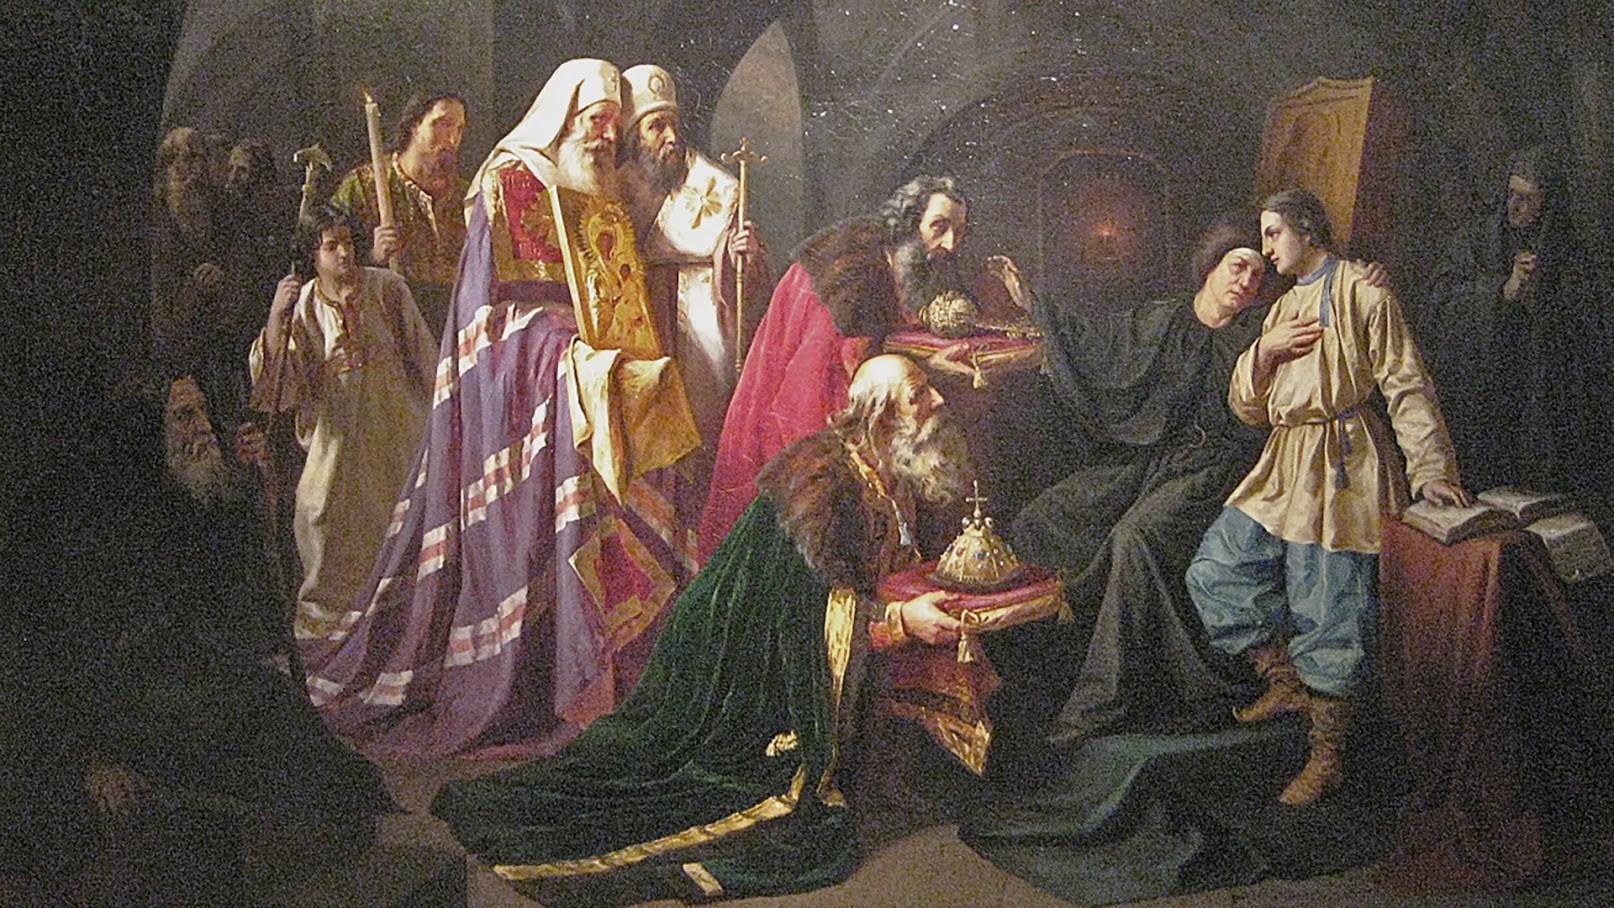 Poziv Mihailu Romanovu, naj prevzame krono. Delo slikarja Nikolaja Šustova.